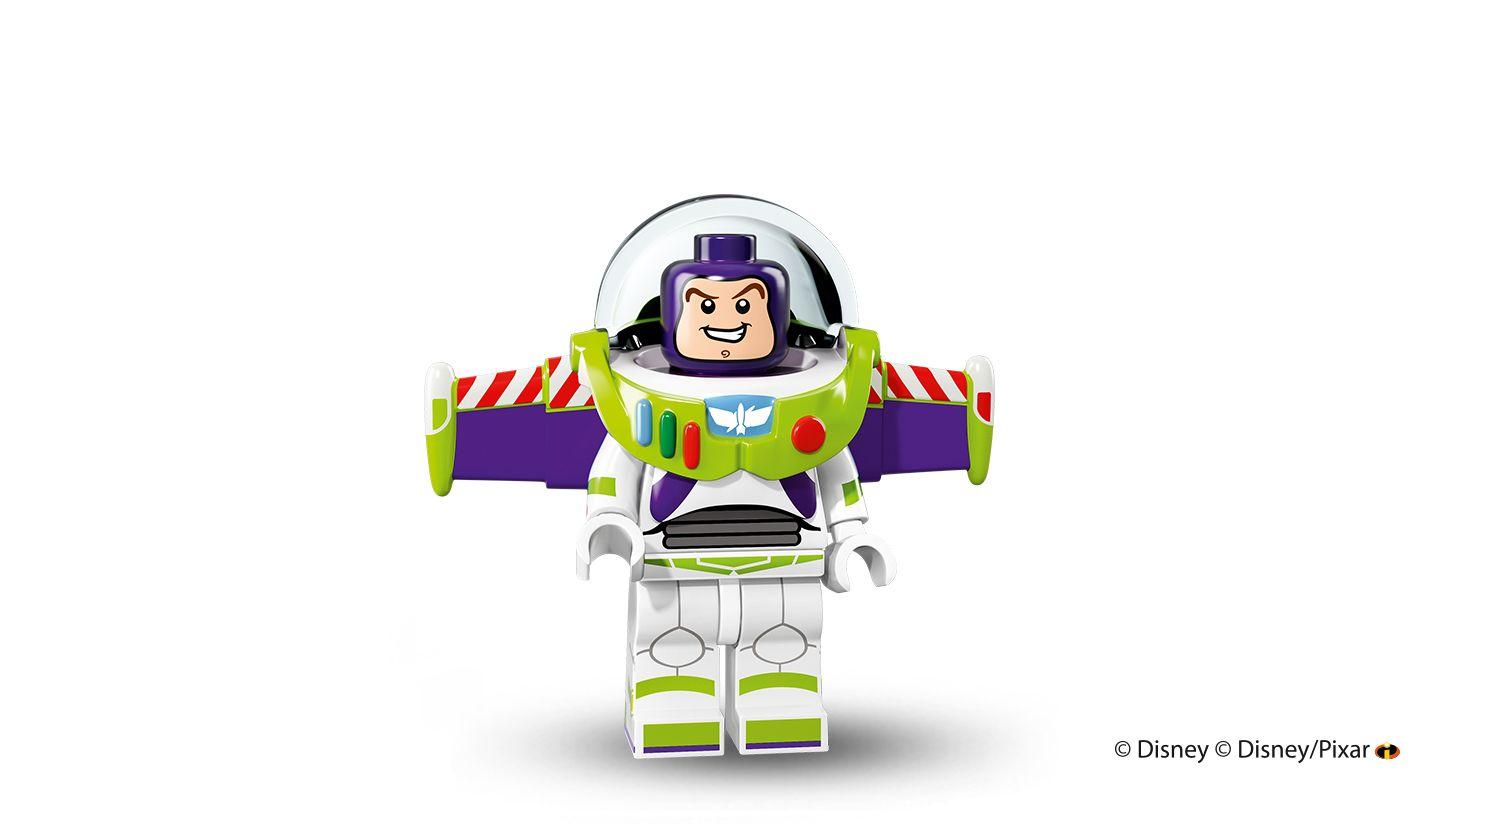 lego disney minifigures images revealed collider